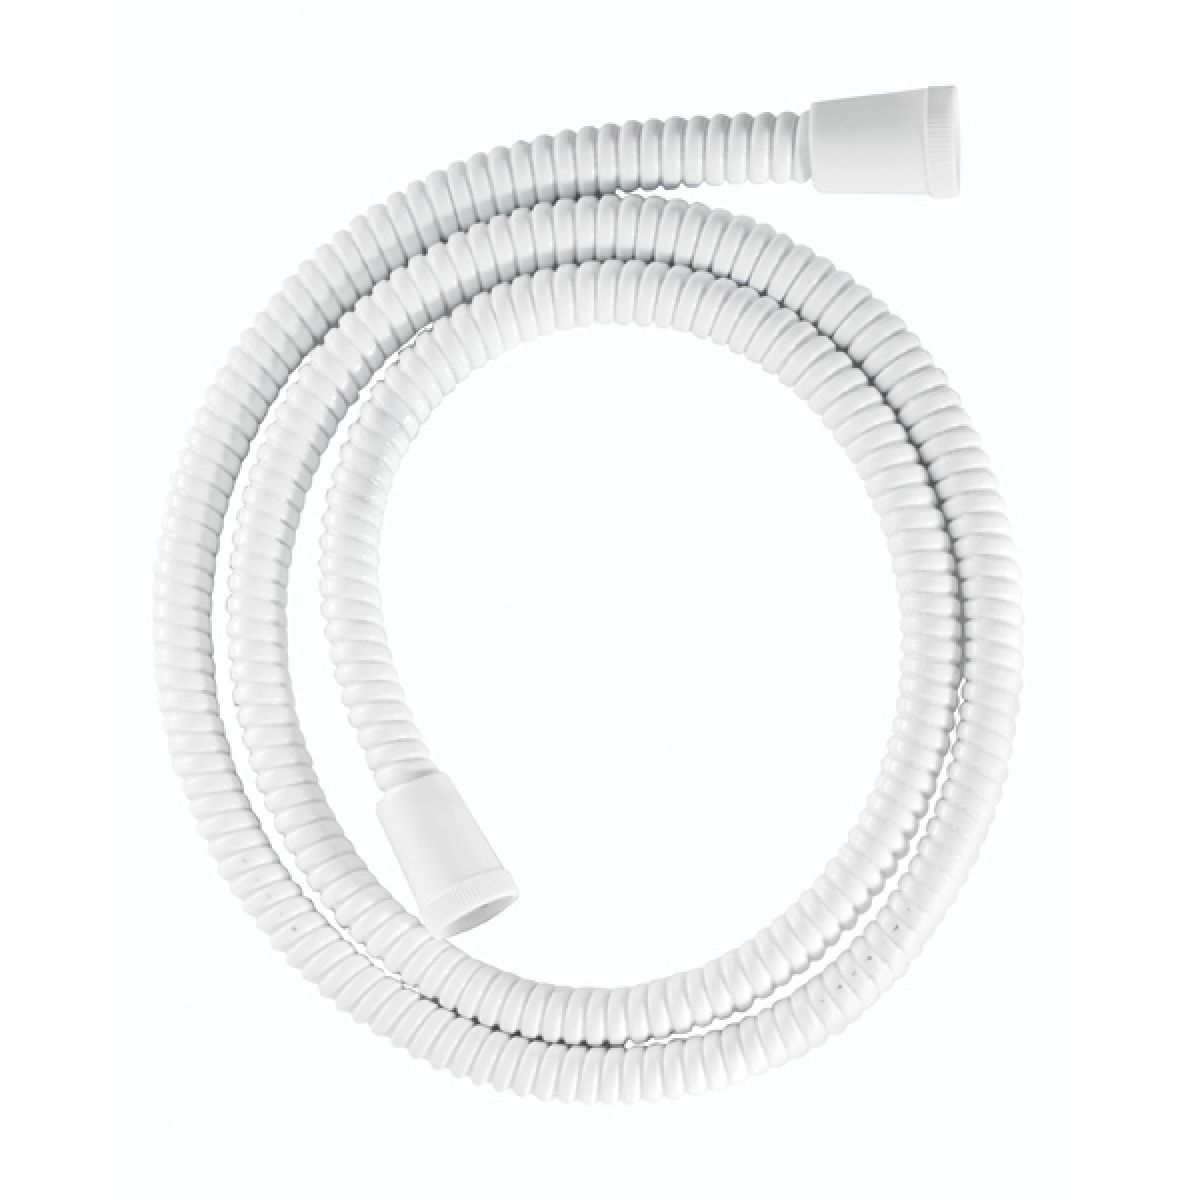 Croydex White PVC Reinforced Shower Hose 1500mm